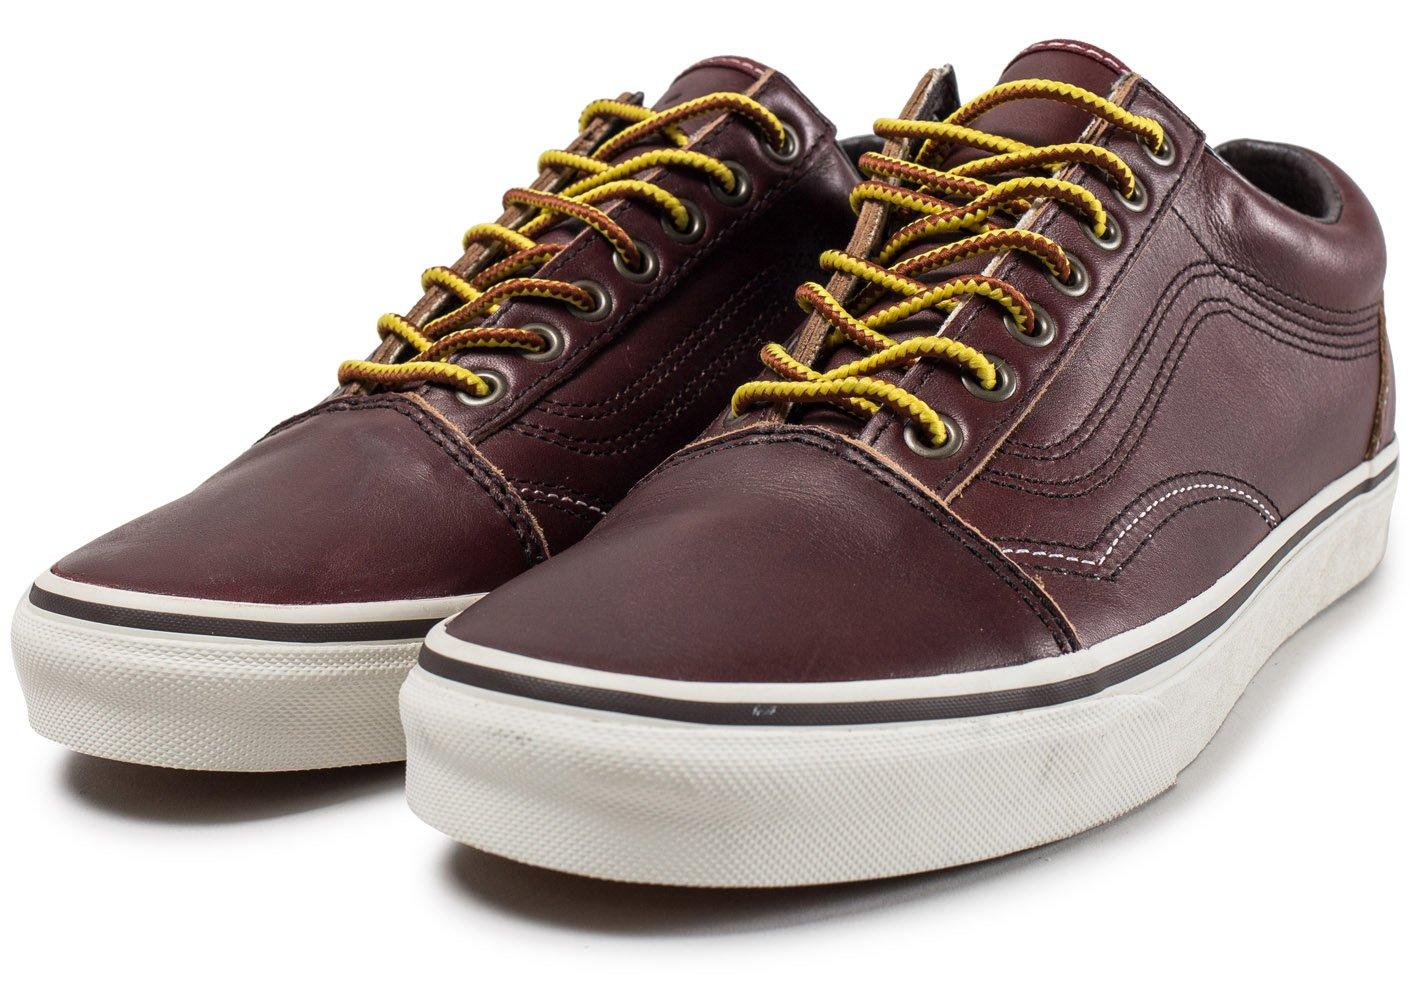 Vans Herren Grau, UA Old Skool Sneaker, Grau, Herren 47 EU Braun 5ceb75